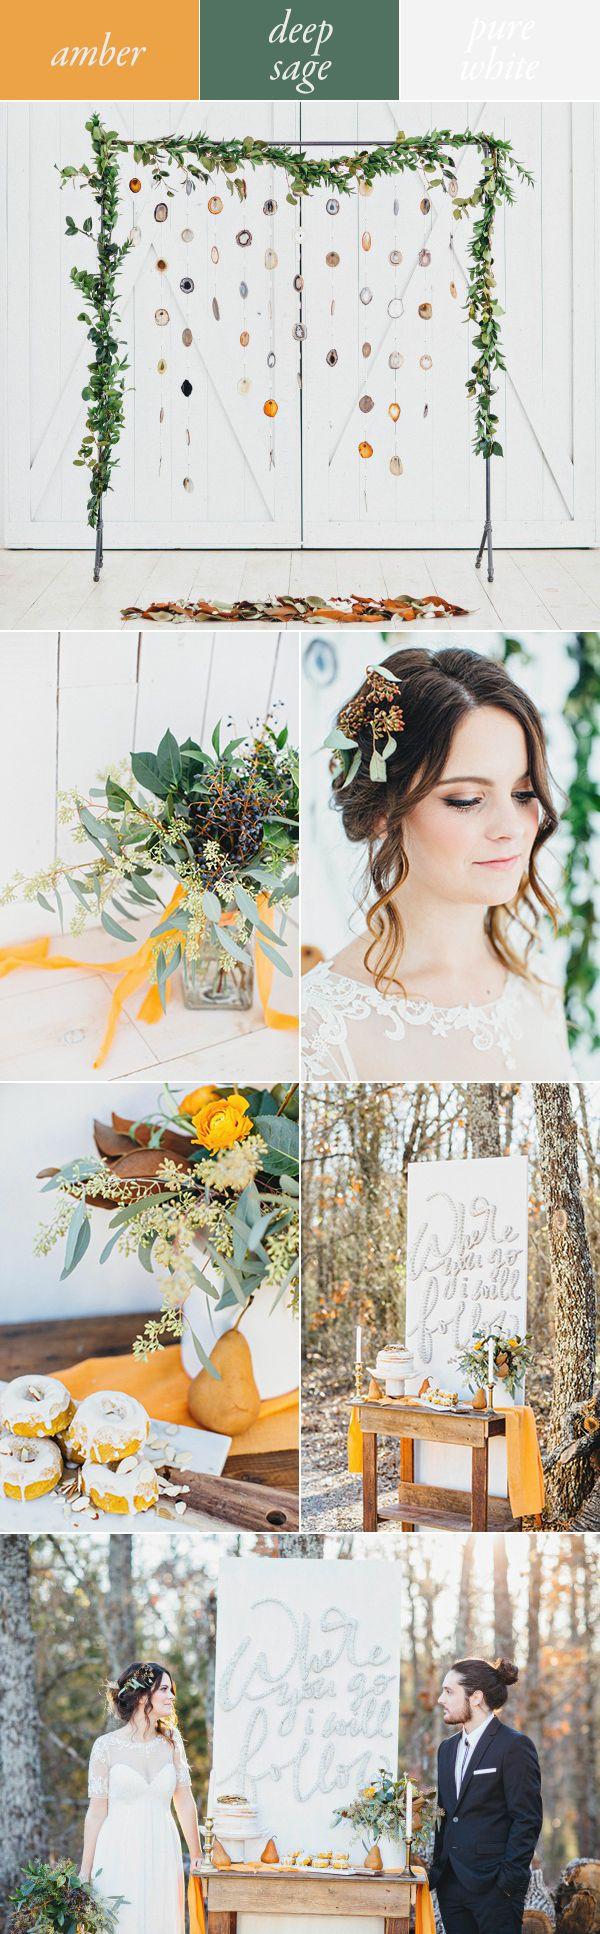 105 best fall wedding images on Pinterest   Fall wedding, Autumn ...